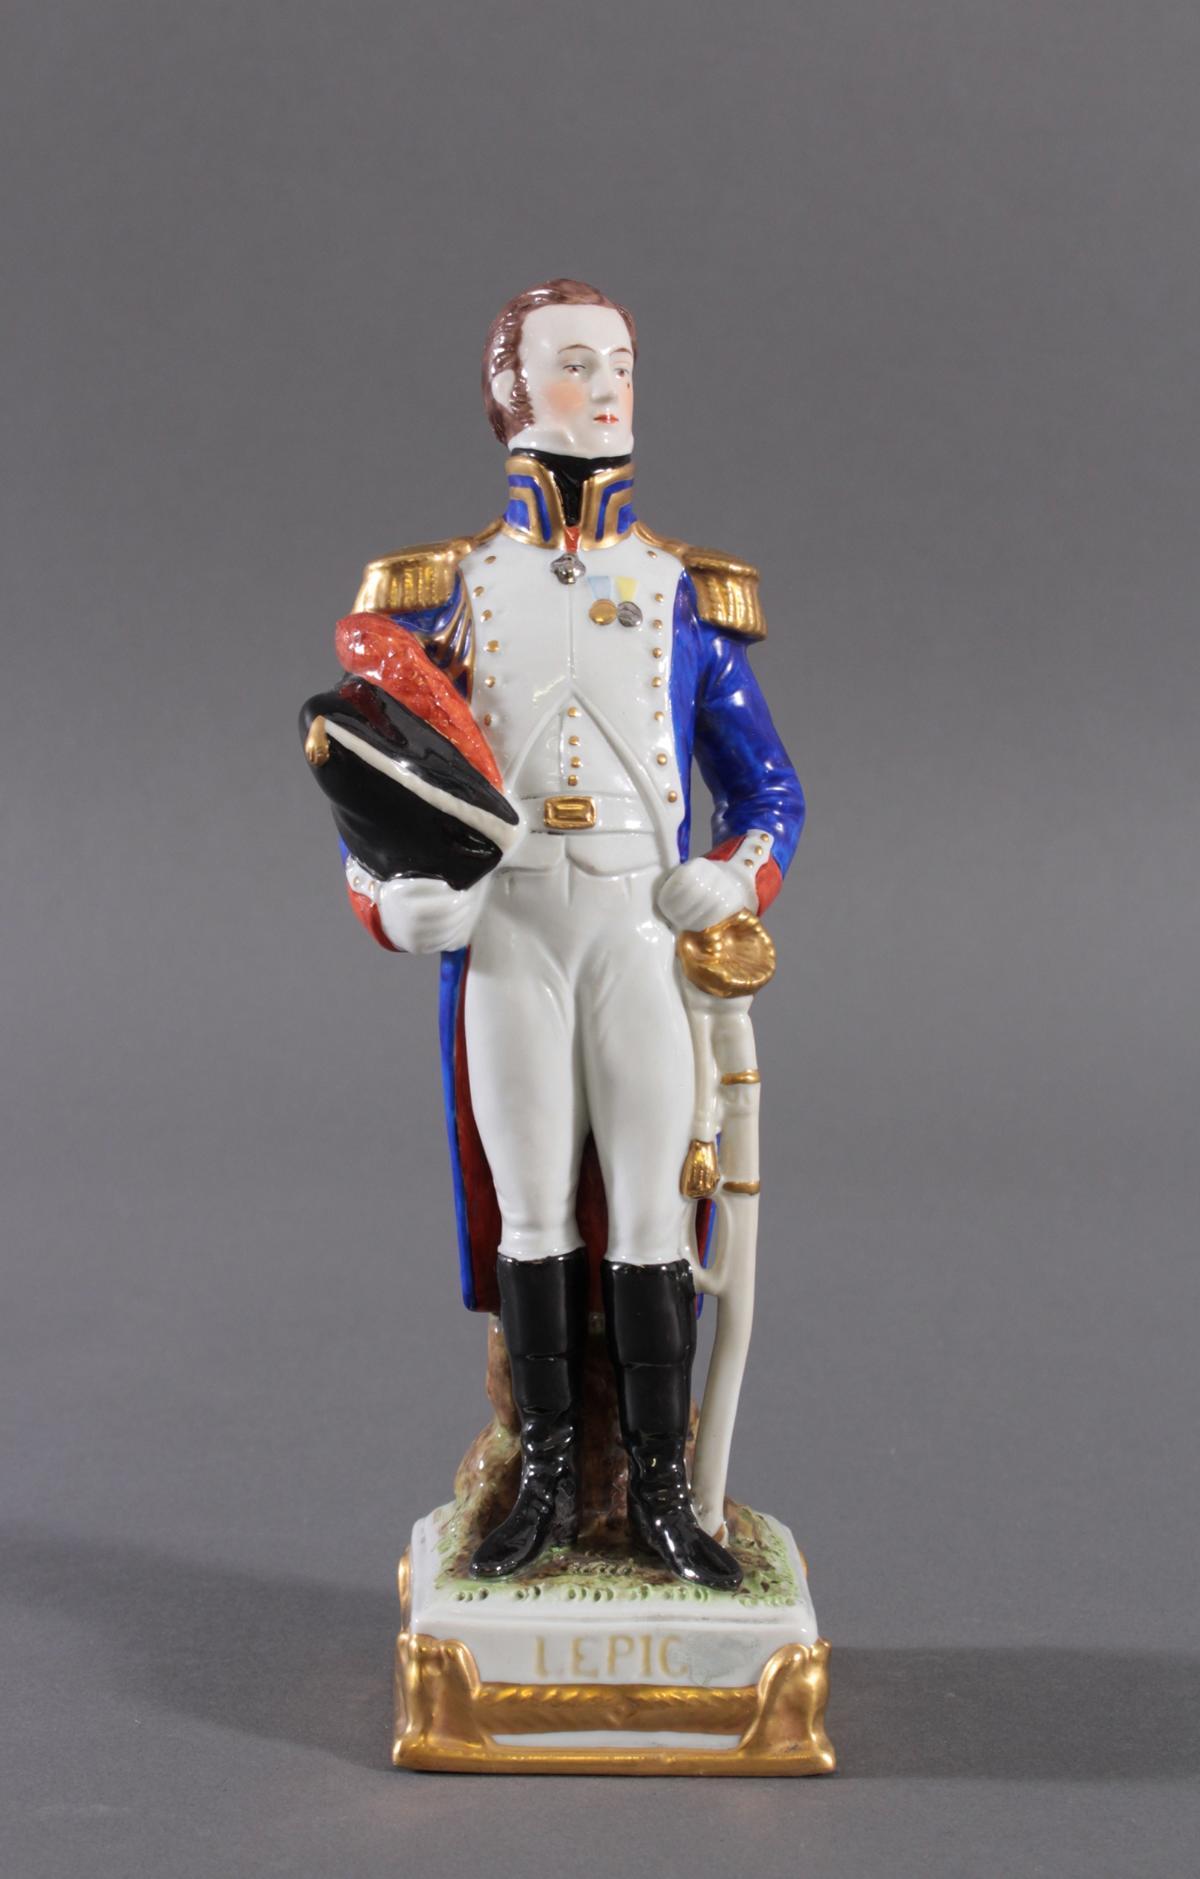 Scheibe Alsbach – Figur, Louis Lepic 1765 – 1827